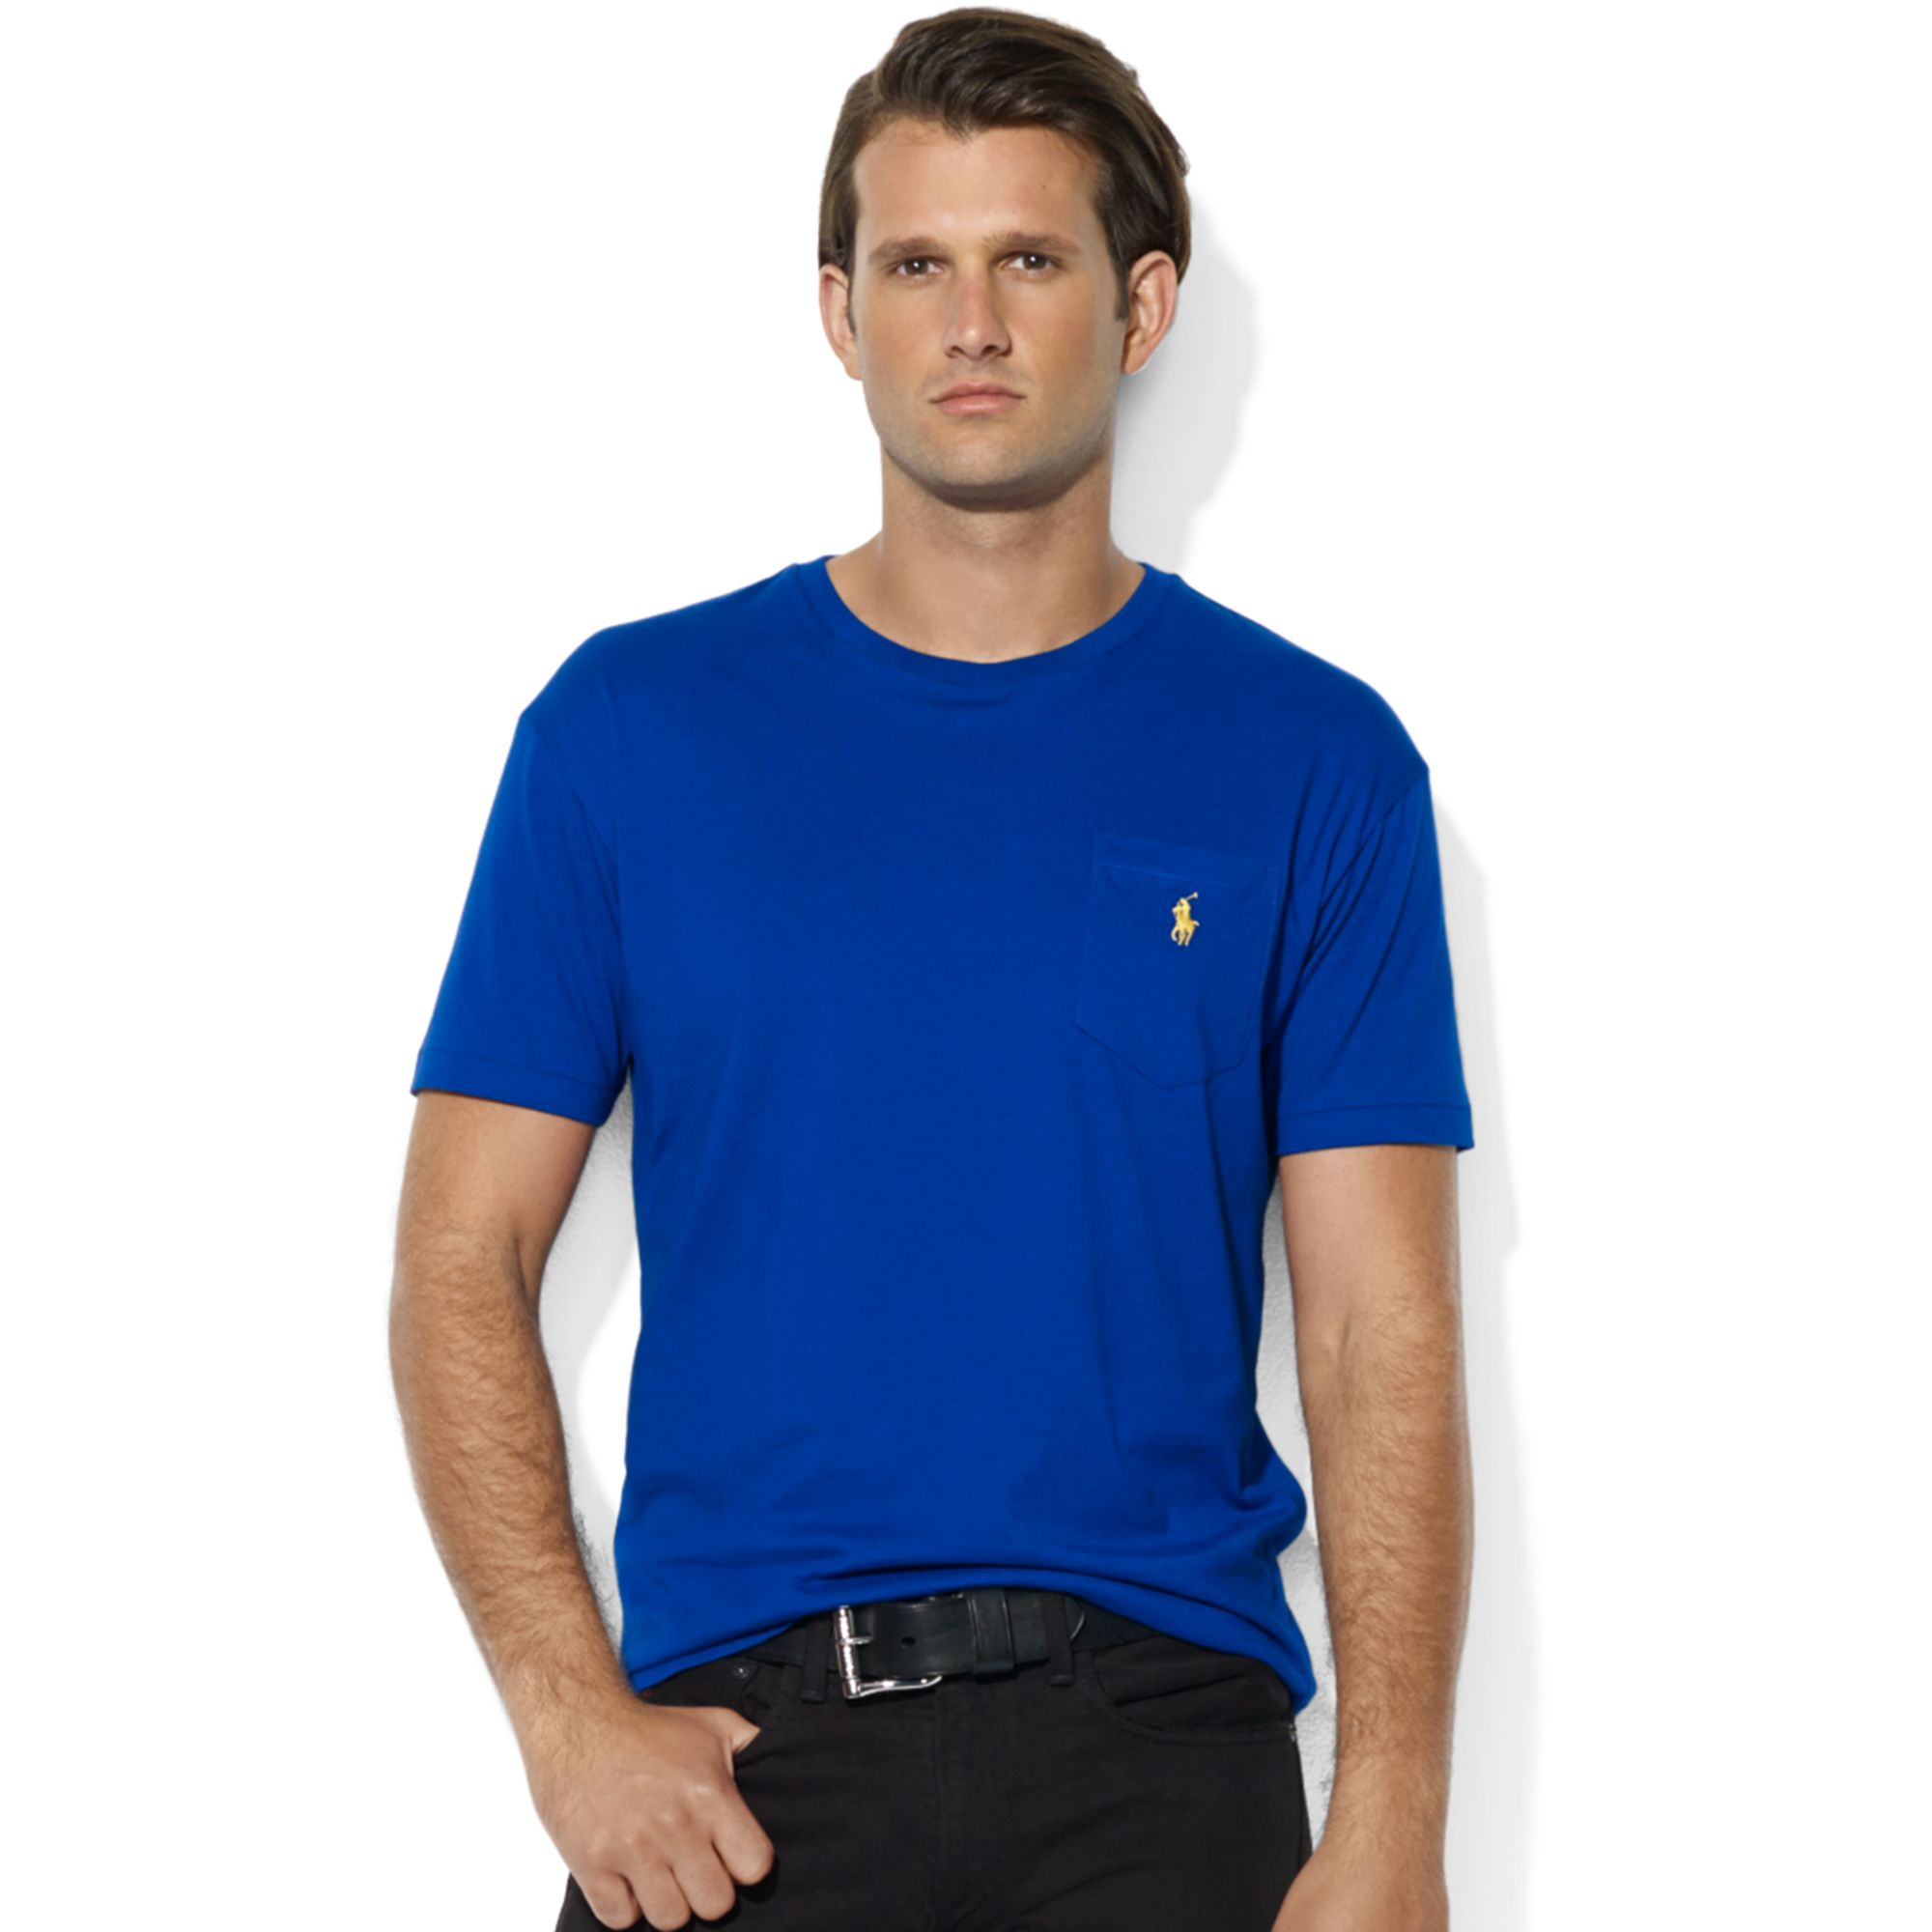 159440b3c Polo Ralph Lauren Stretch Cotton Jersey V Neck T Shirt - Cotswold Hire